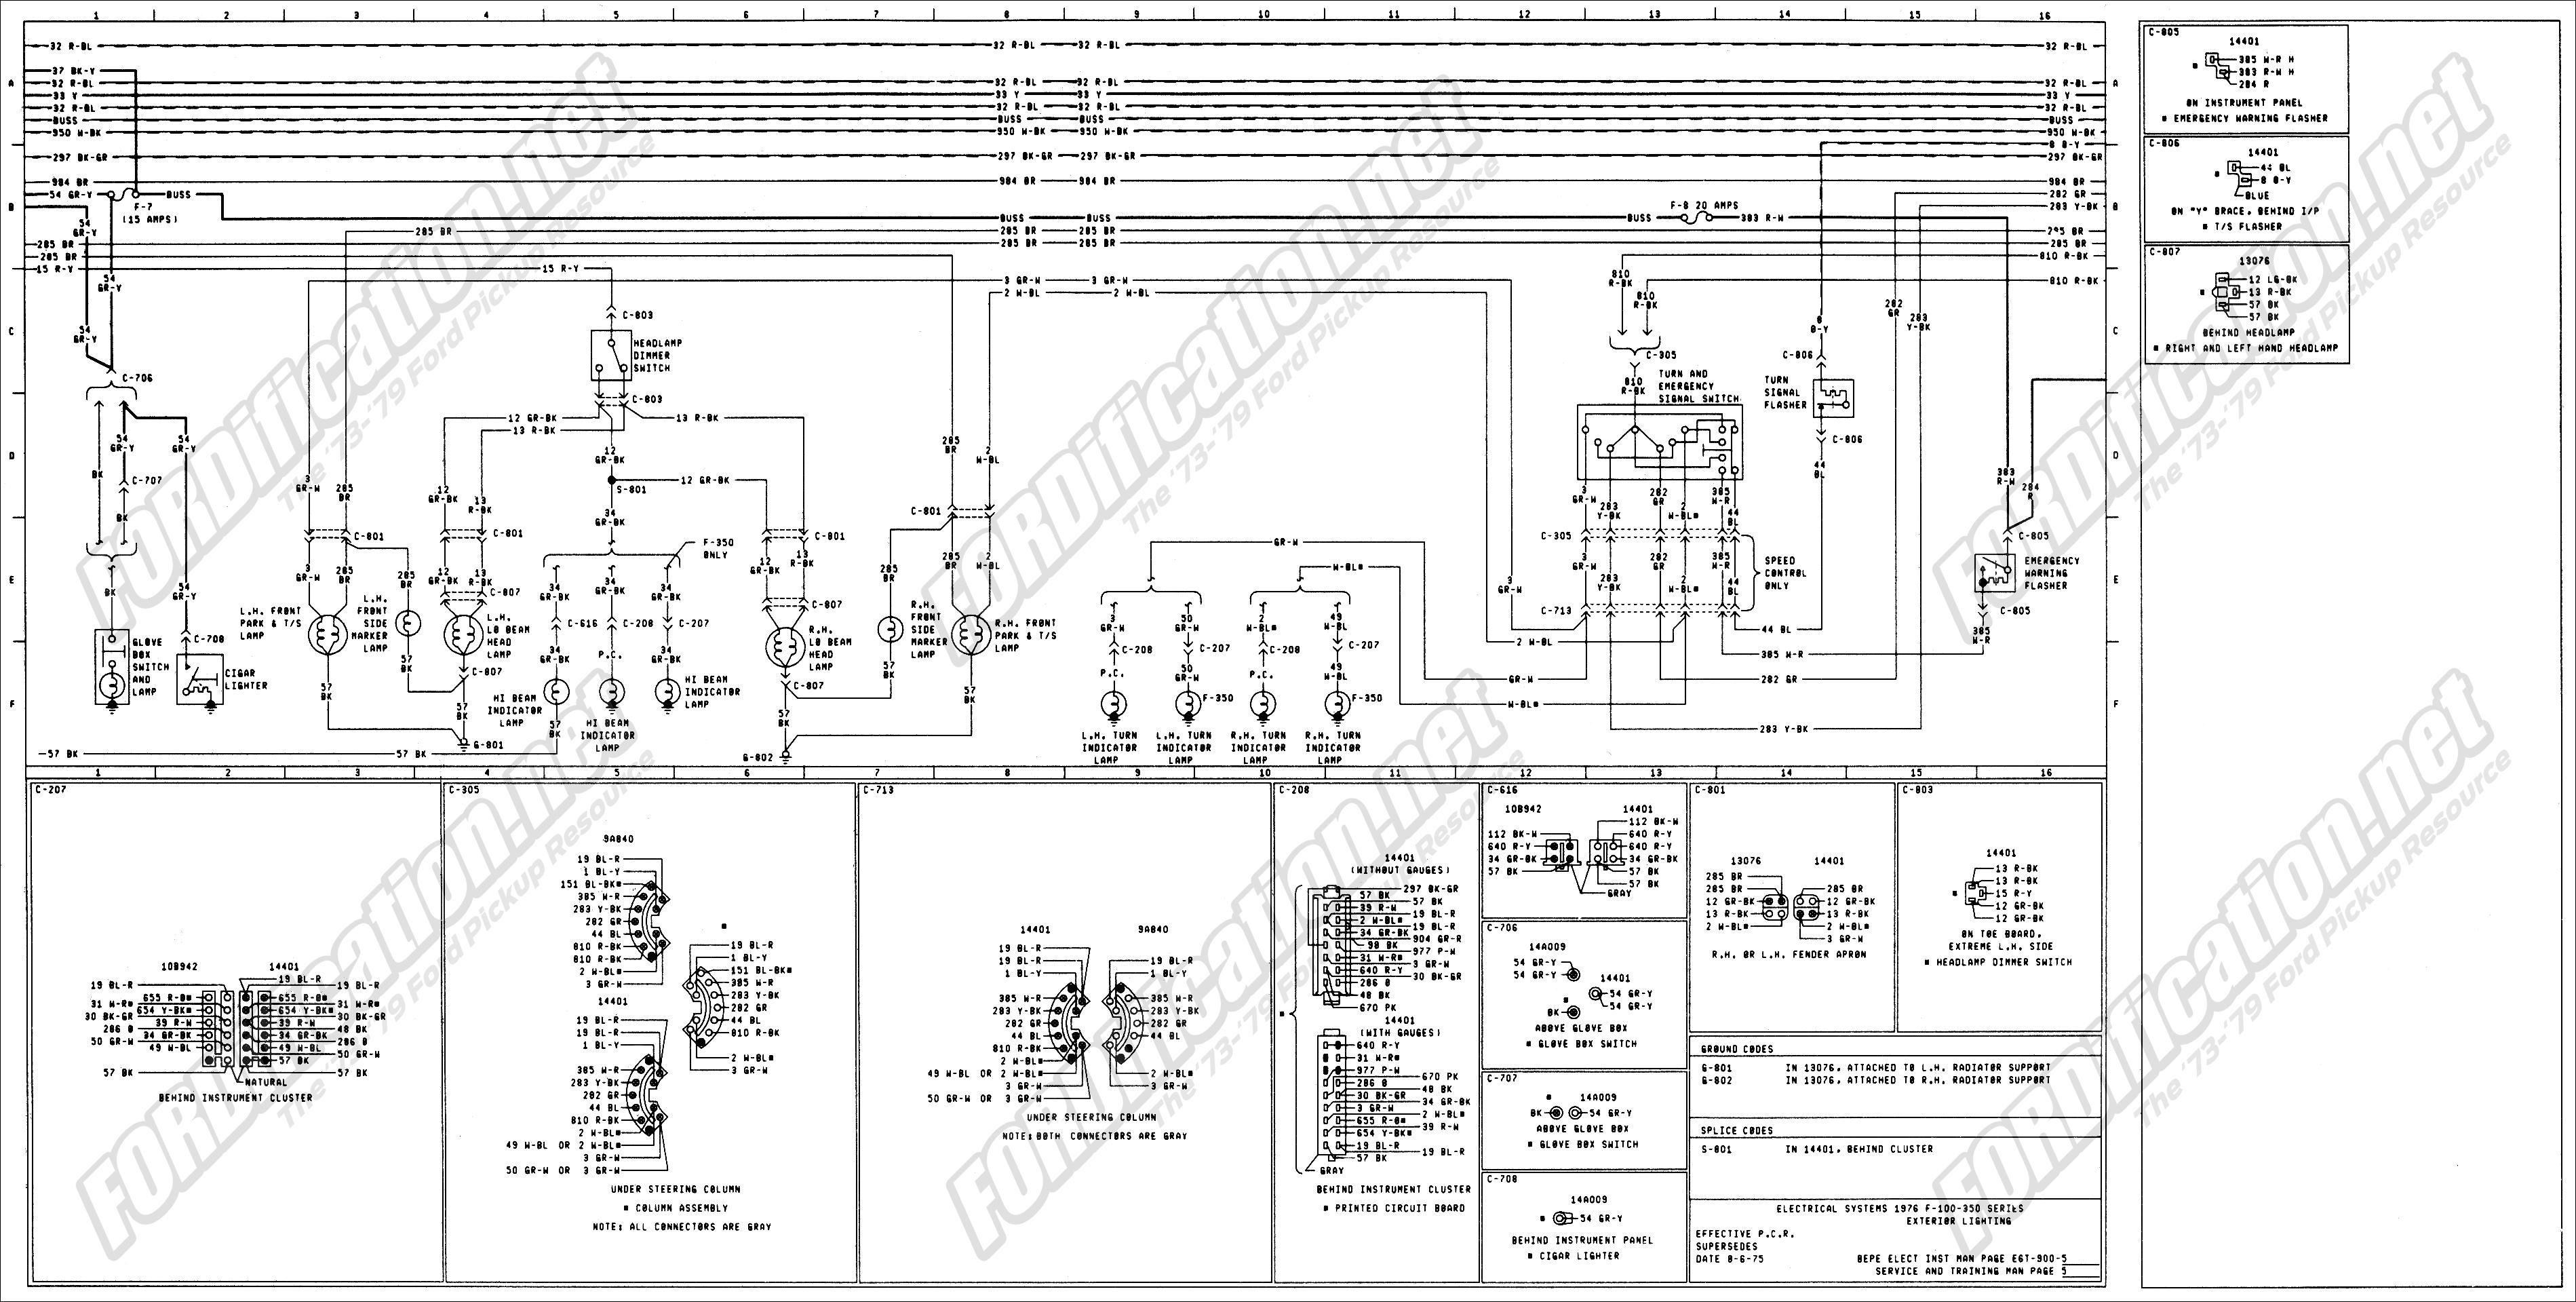 1976 Ford Turn Signal Switch Wiring Diagram - Wiring Diagrams Hubs - Ford F250 Wiring Diagram For Trailer Lights